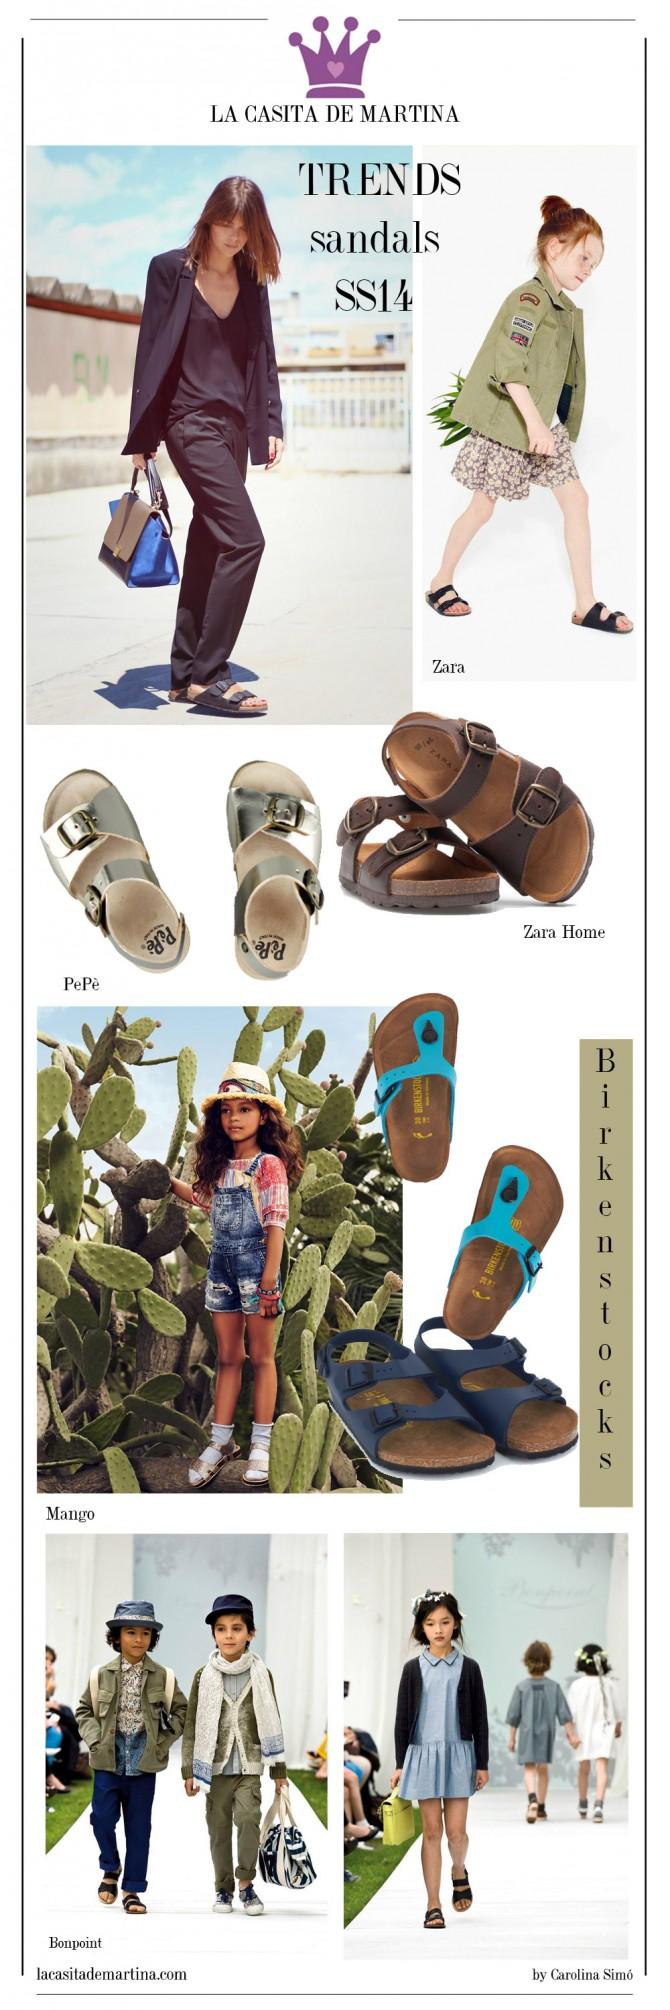 Mango, Birkenstock, Zara, Ugly shoes, PePè shoes,  Blog Moda Infantil, La casita de Martina